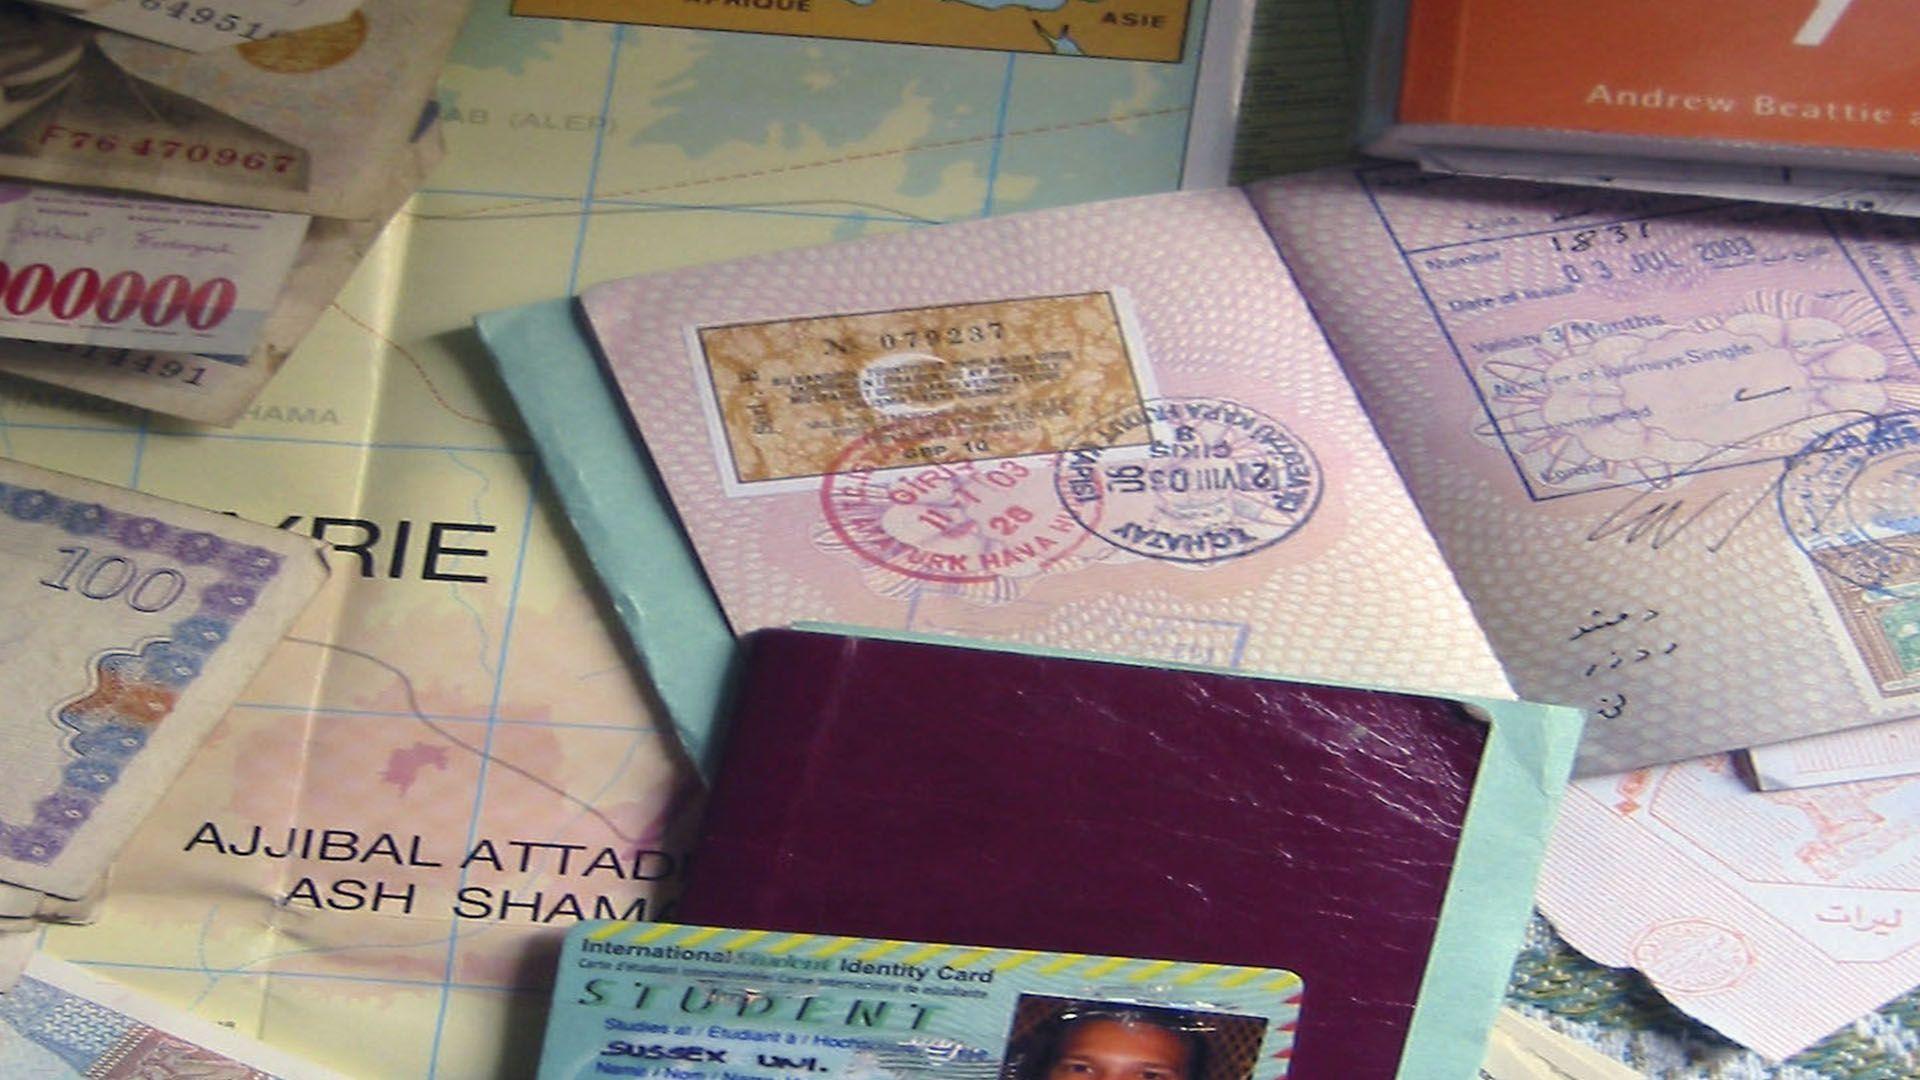 Carimbe seu passaporte!